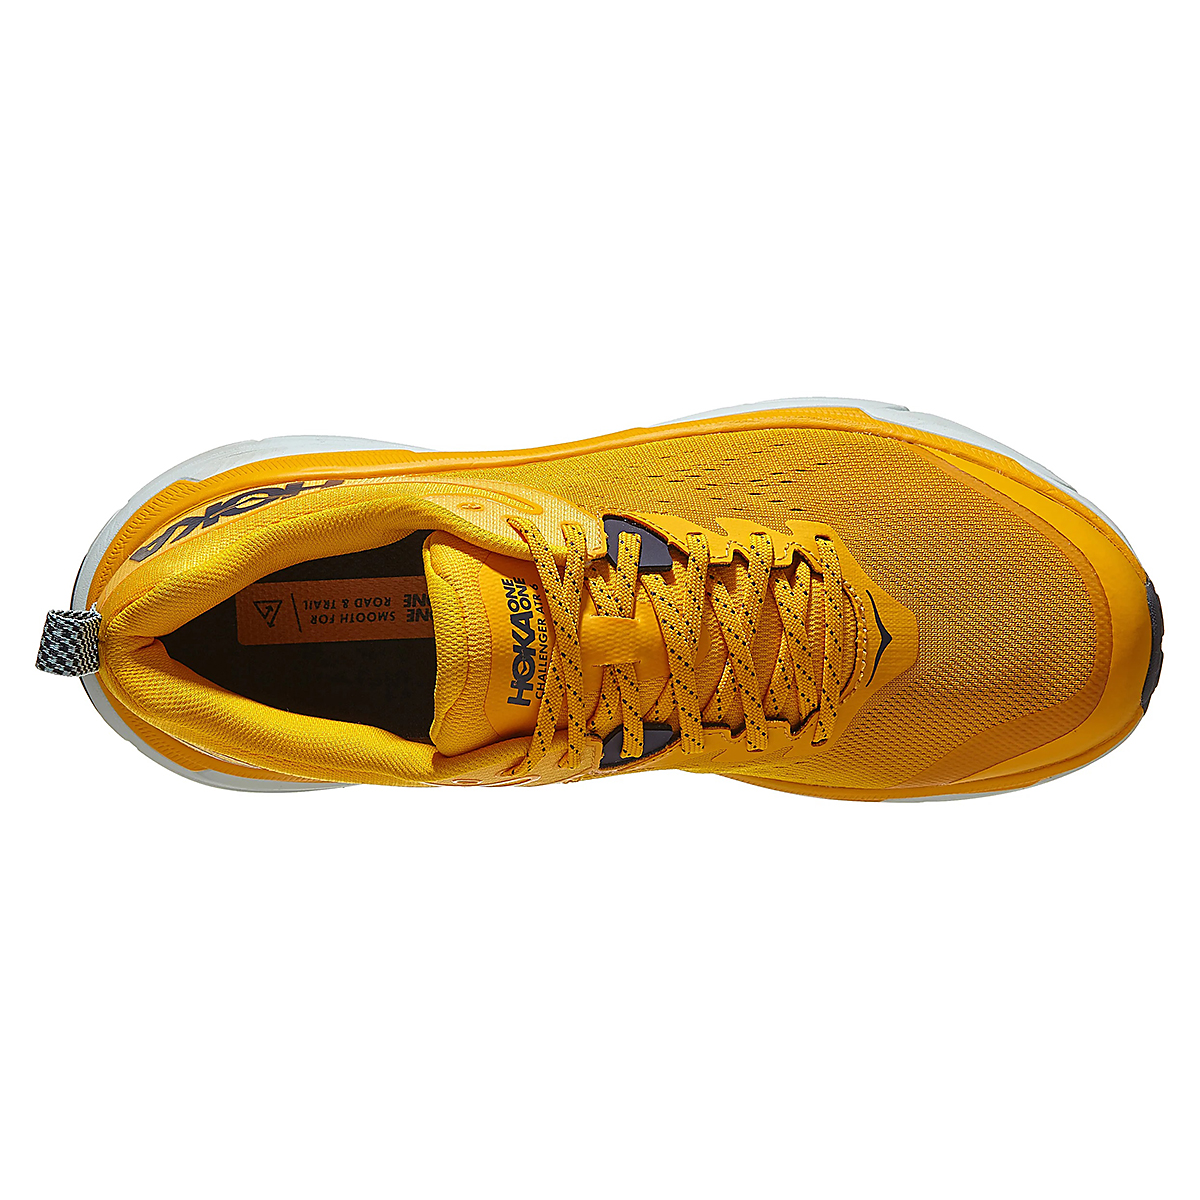 Men's Hoka One One Challenger ATR 6 Running Shoe - Color: Saffron / Morning Mist - Size: 7 - Width: Regular, Saffron / Morning Mist, large, image 4